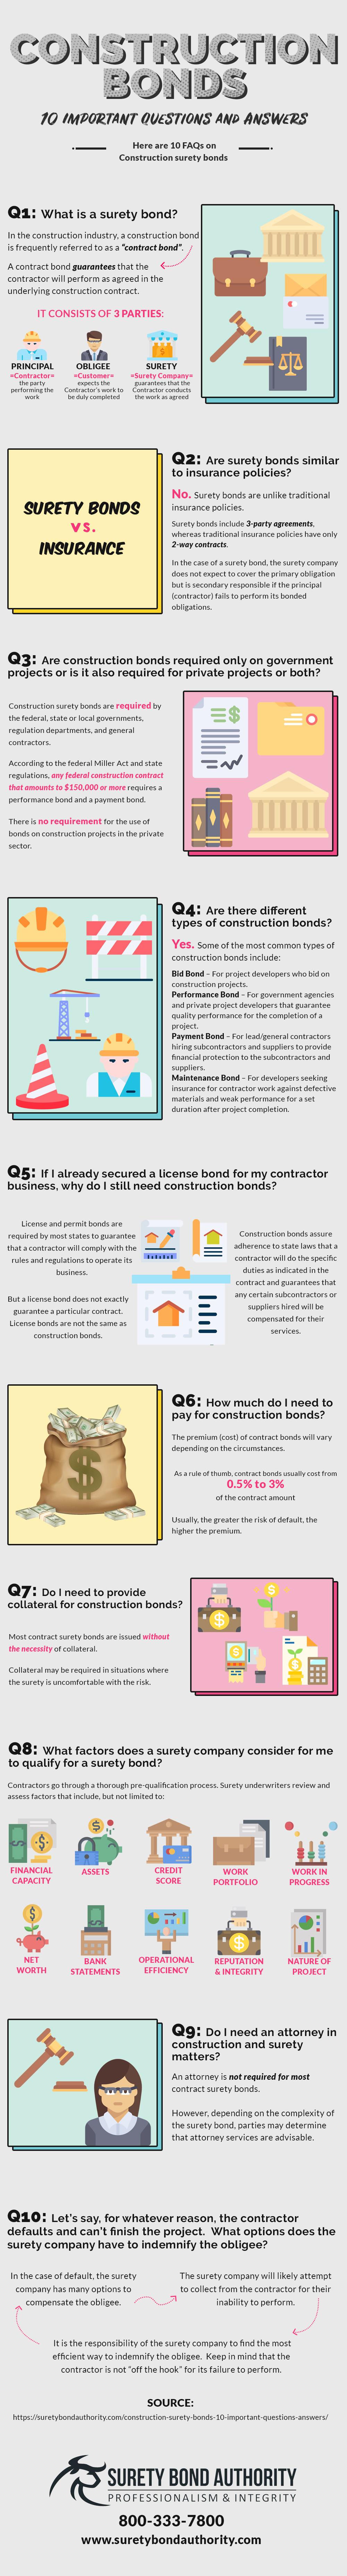 Construction Surety Bonds FAQ Infographic